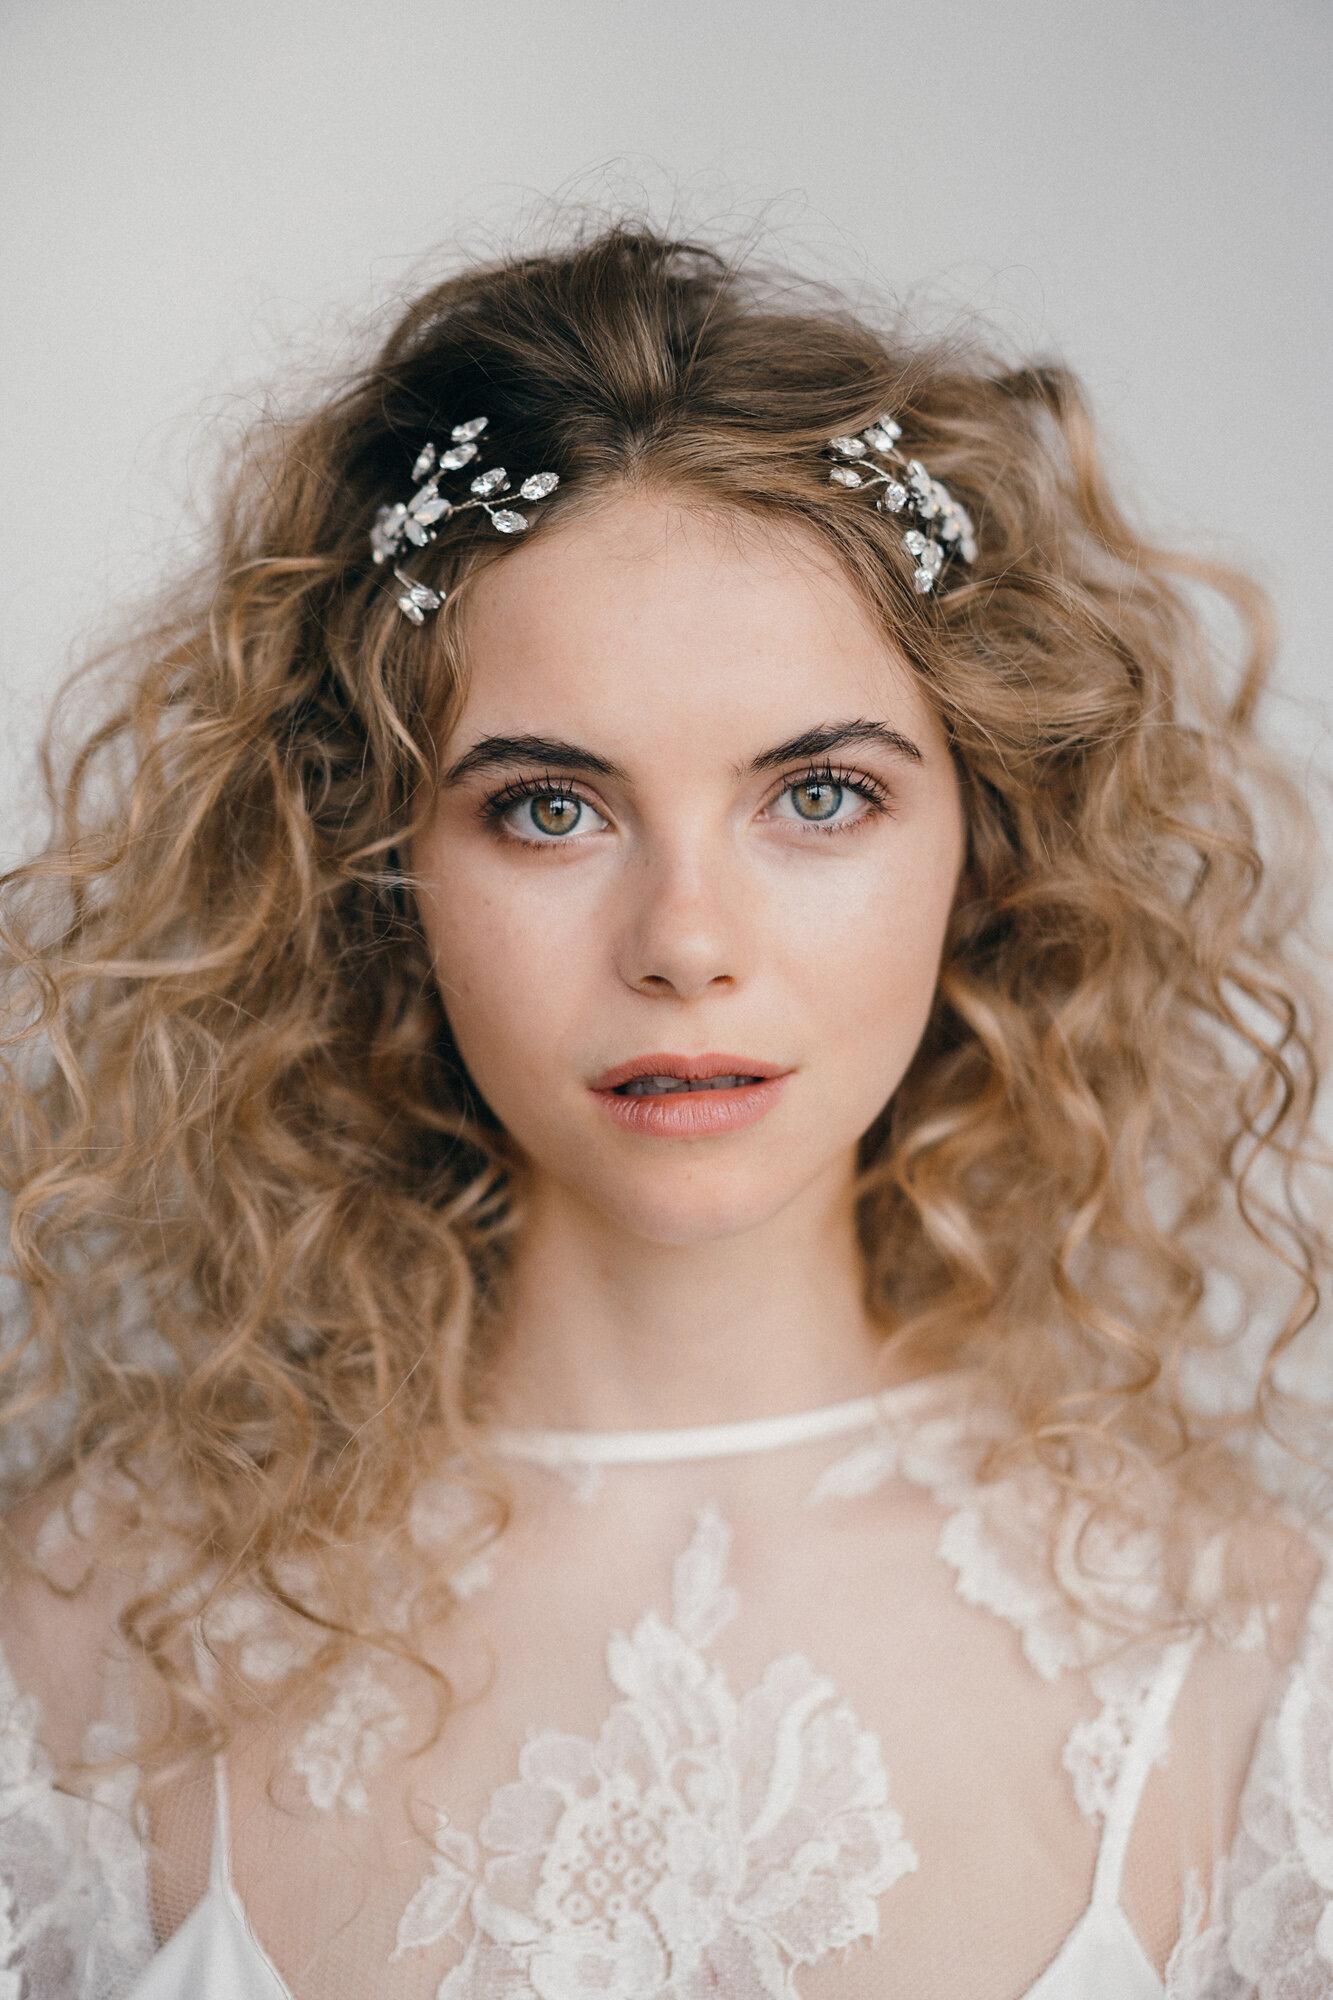 Debbie-Carlisle-Bridal-Accessories-Kate-Beaumont-Wedding-Gowns-Sheffield-Yorkshire-UK-39.jpg